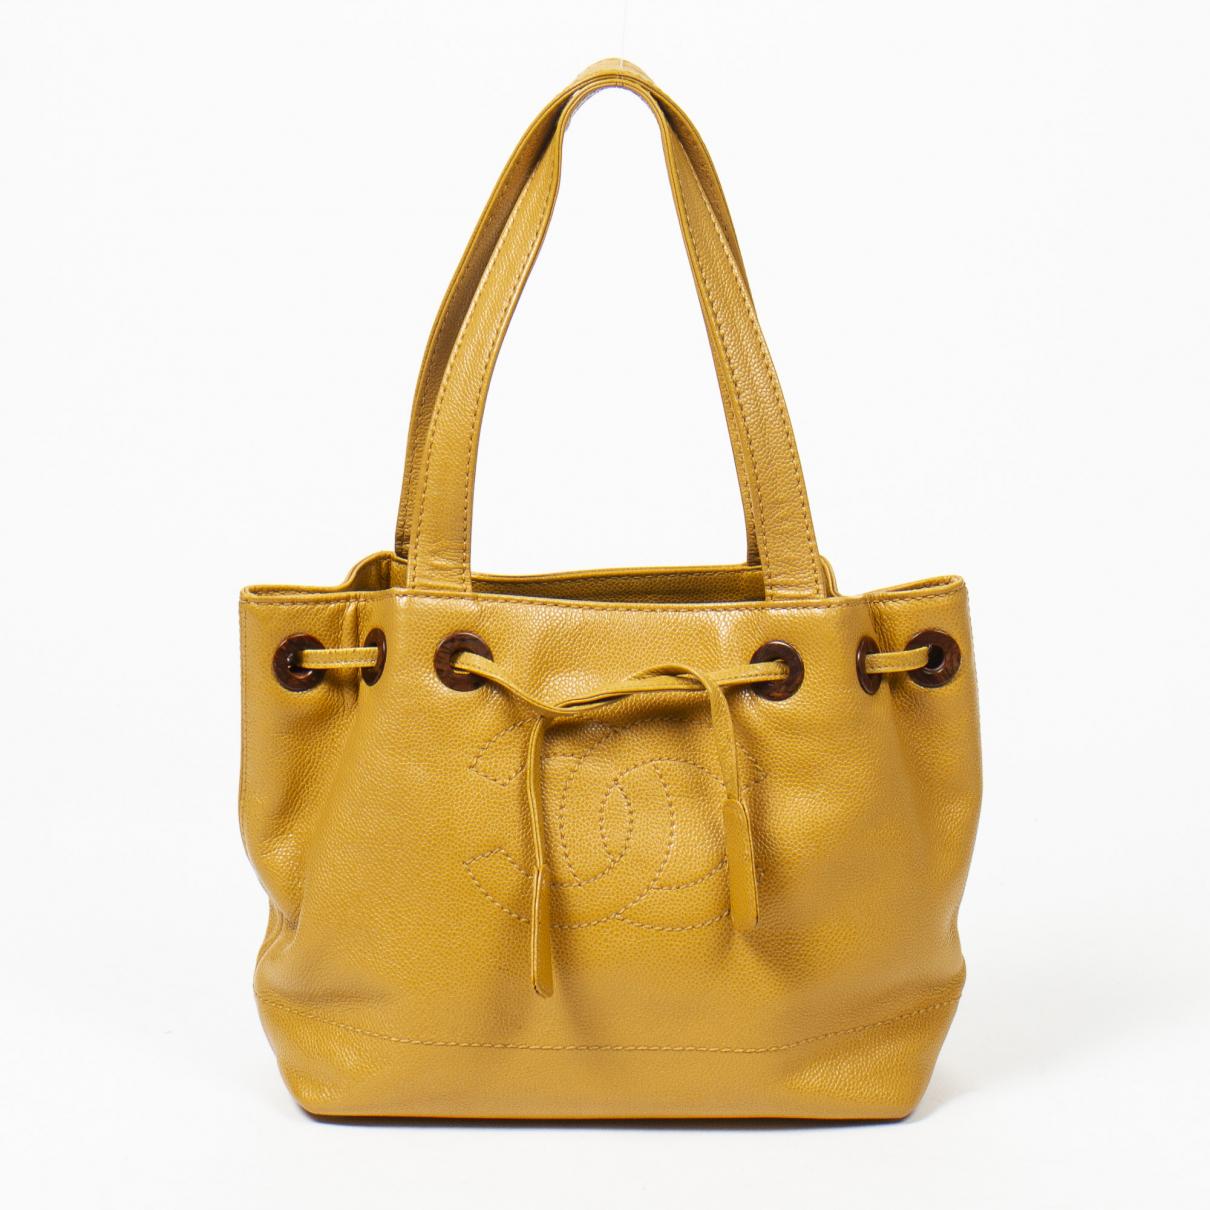 Chanel \N Yellow Leather handbag for Women \N